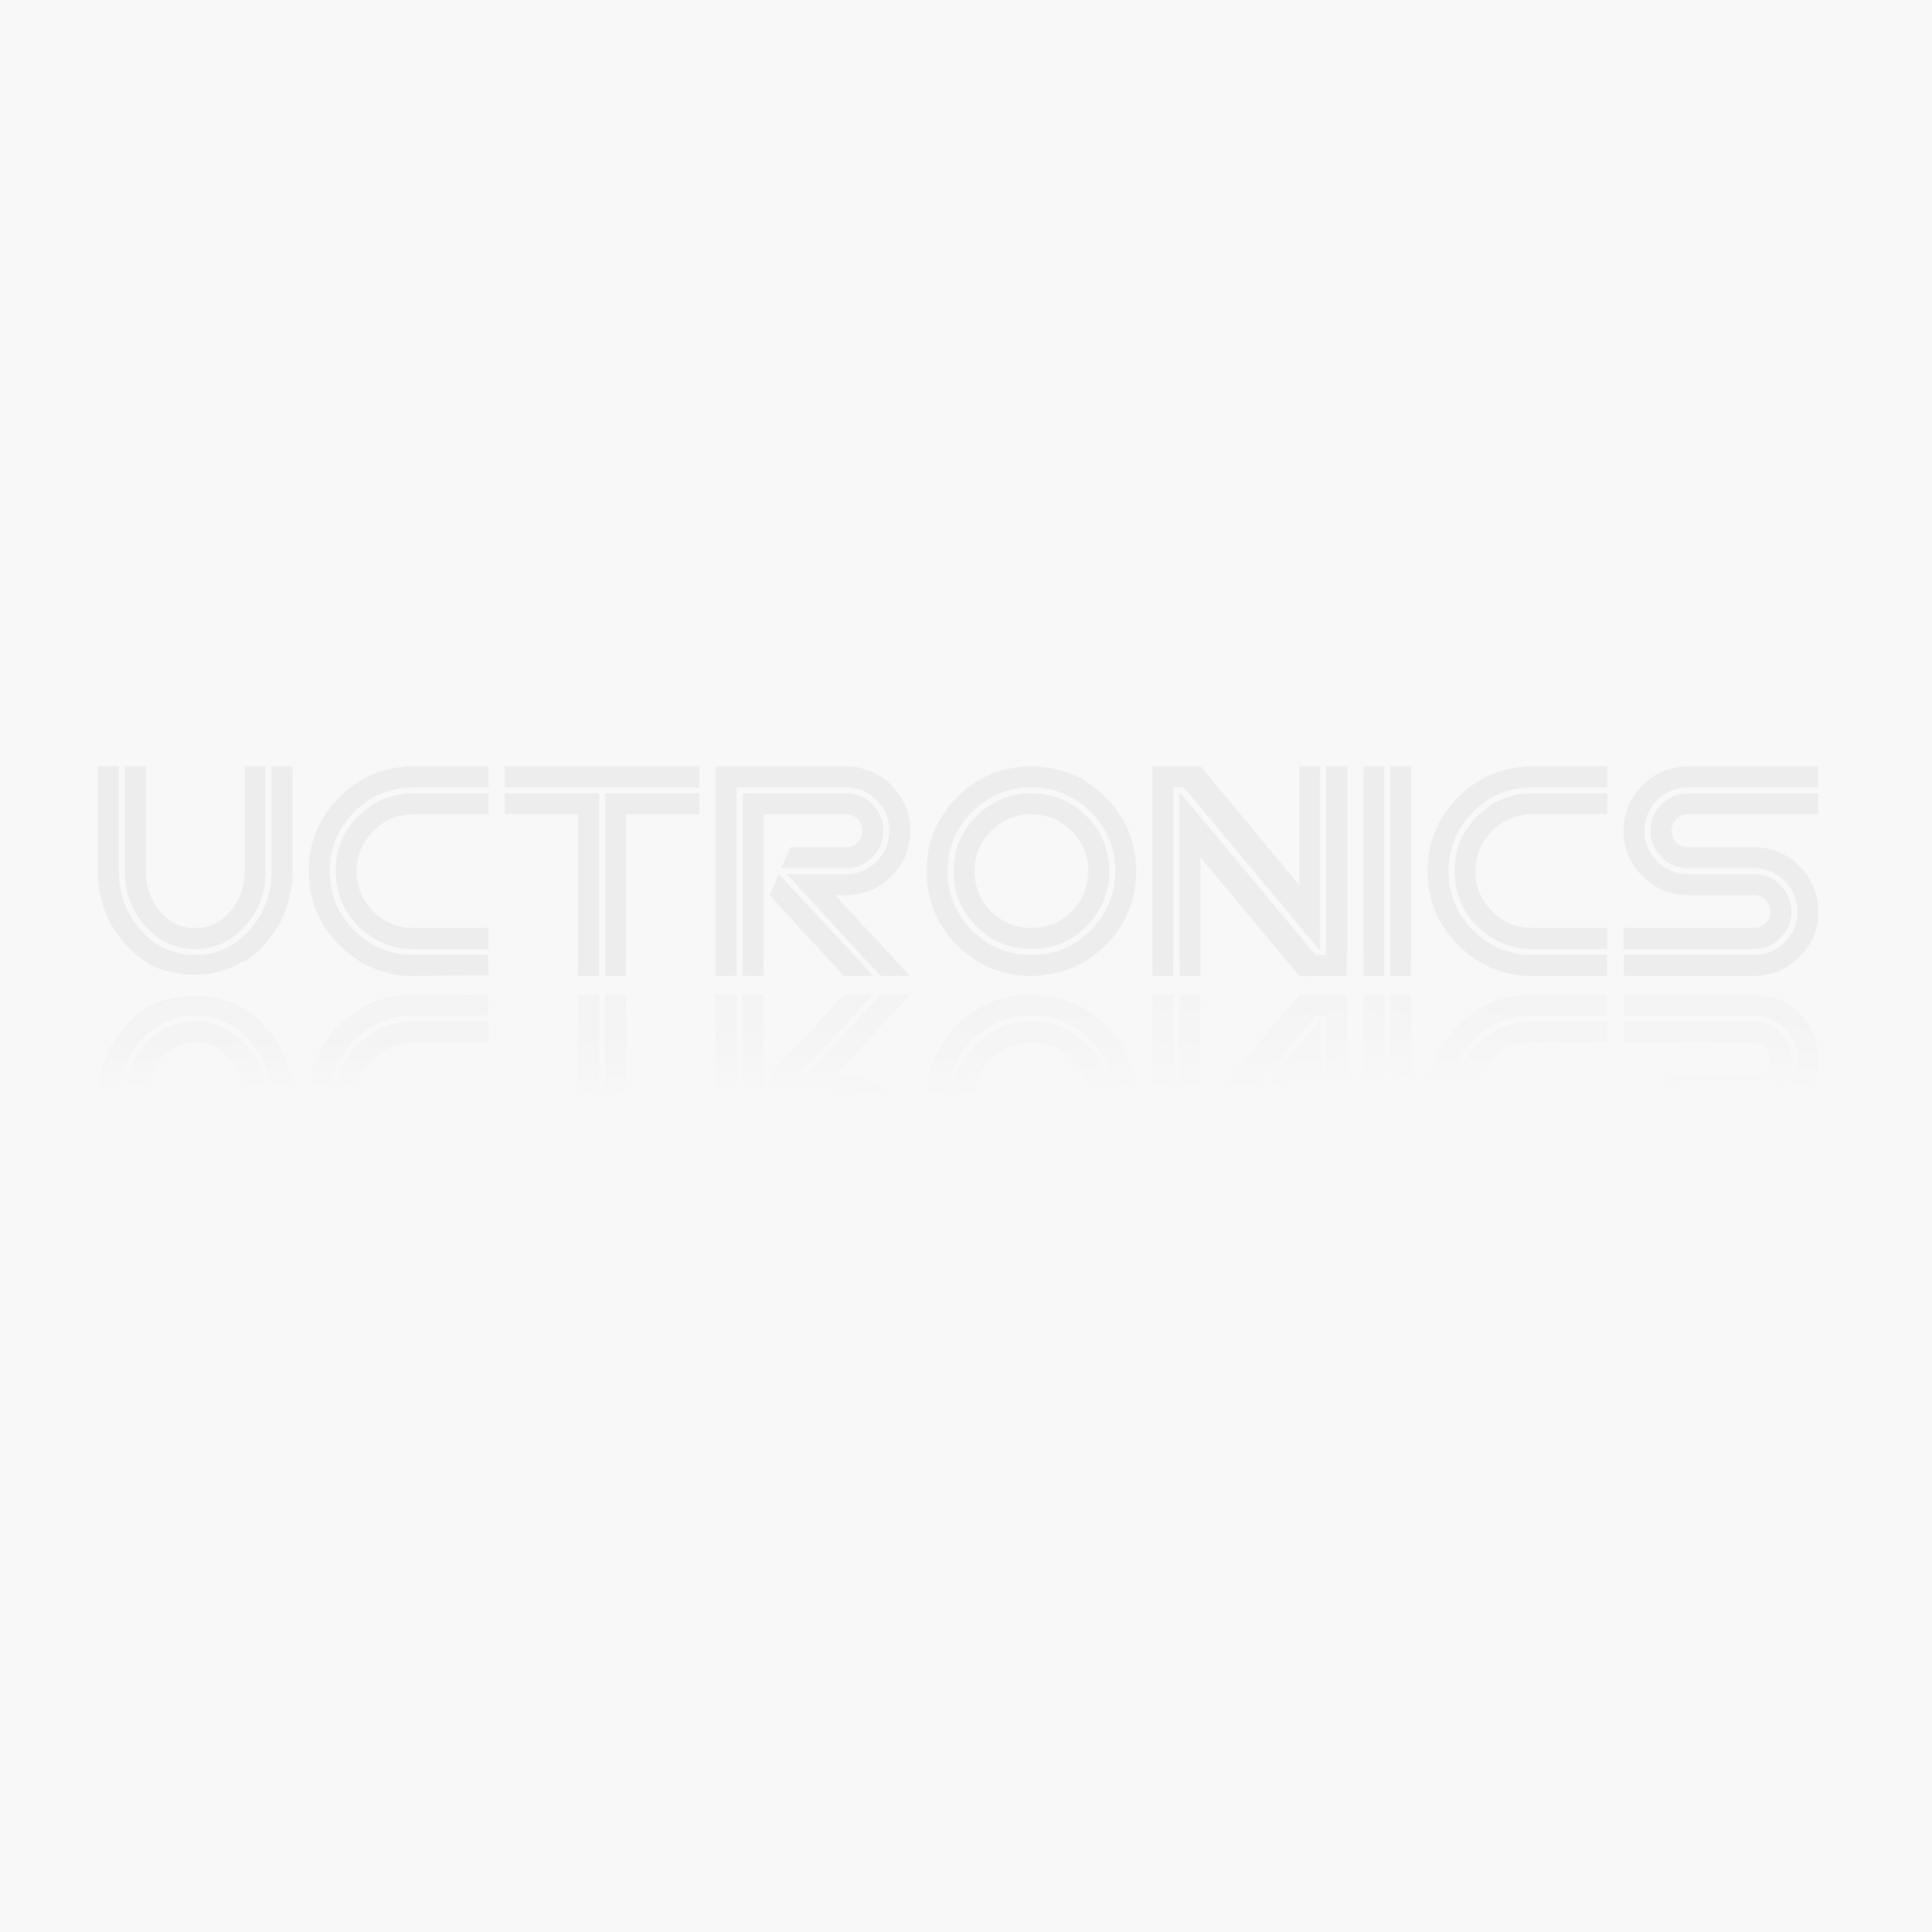 Arducam OV9281 1MP Global Shutter Monochrome NoIR Camera Module with M12 Mount lens for Raspberry Pi 4/3B+/3